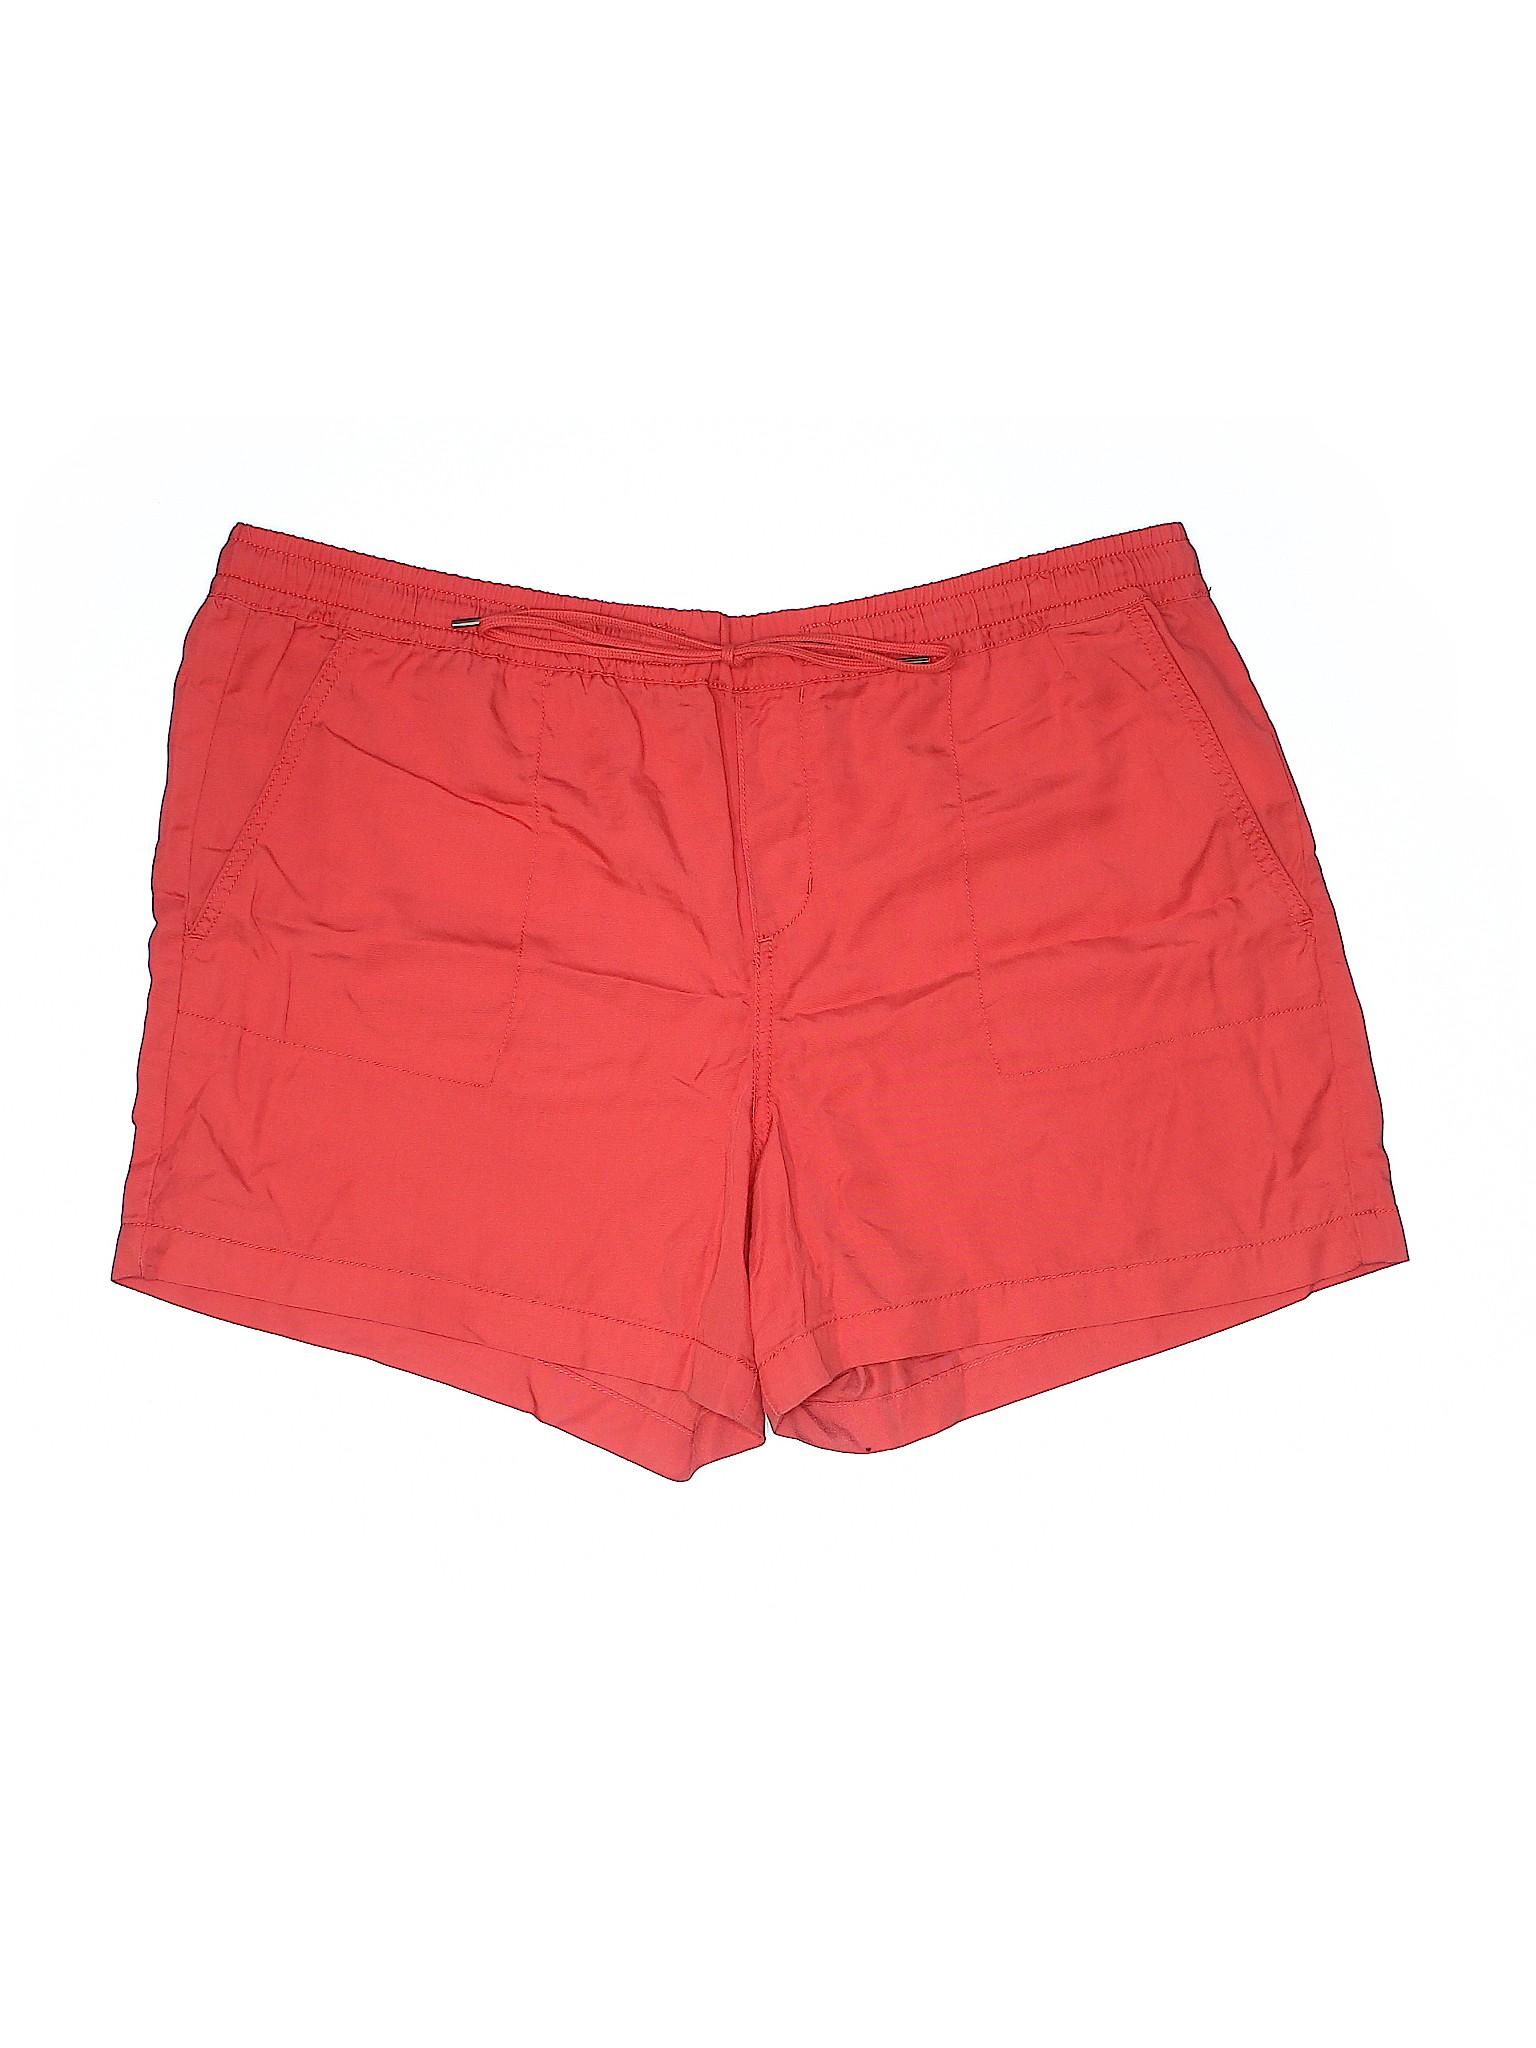 Shorts JEANS Boutique CALVIN Boutique KLEIN JEANS JEANS Boutique CALVIN Shorts KLEIN CALVIN Boutique KLEIN Shorts 14xRwInO